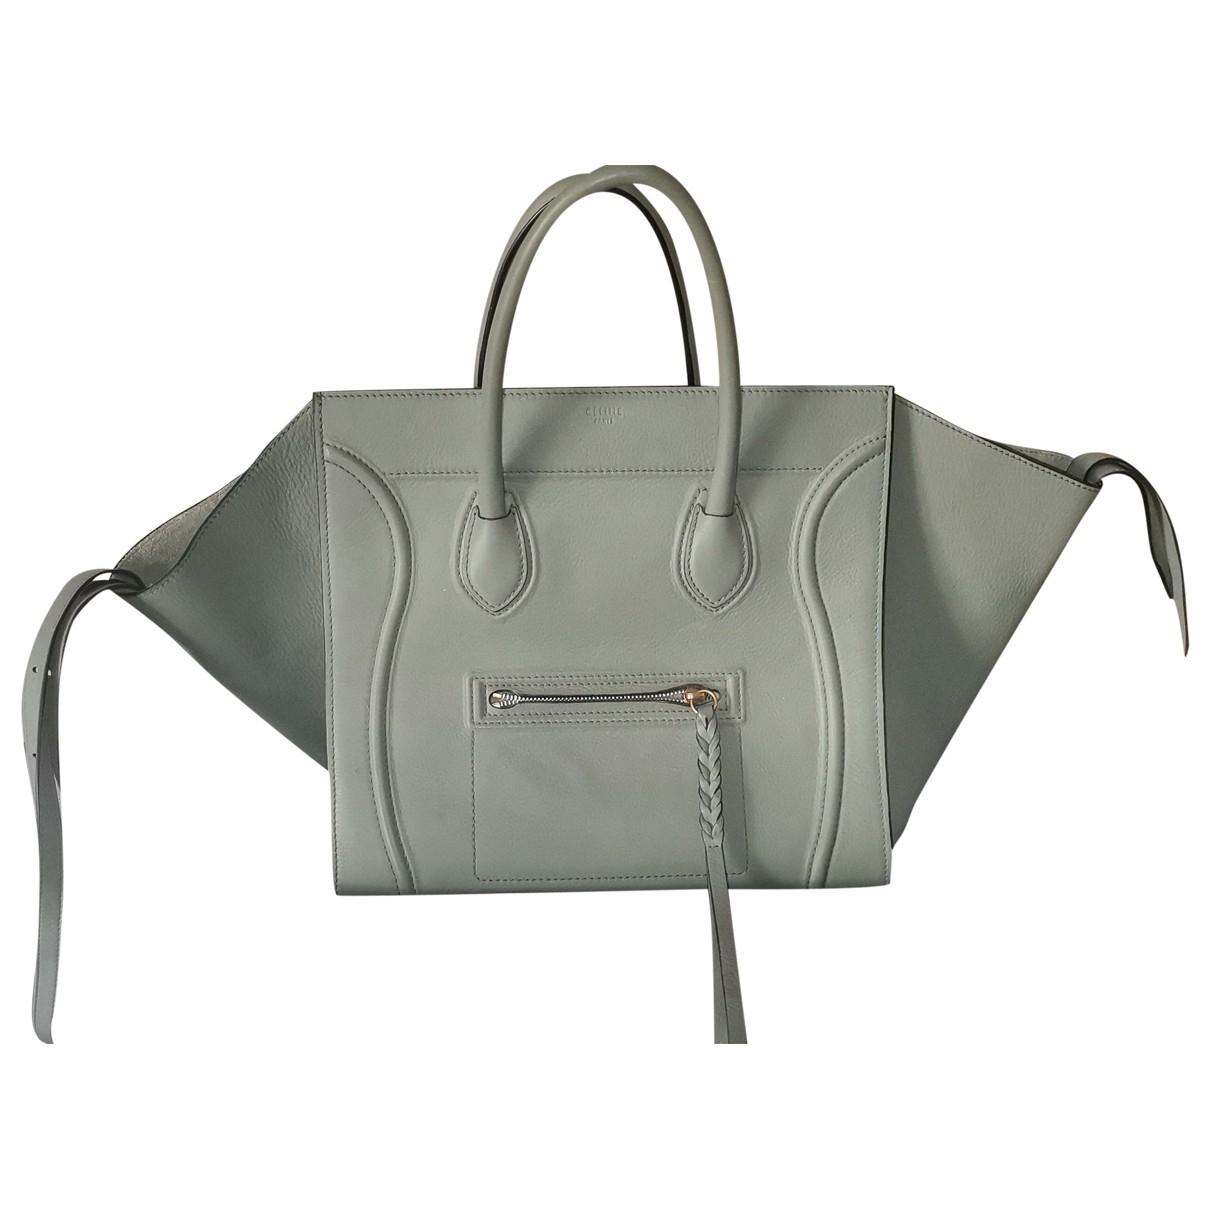 Celine Luggage Phantom Khaki Leather handbag for Women \N